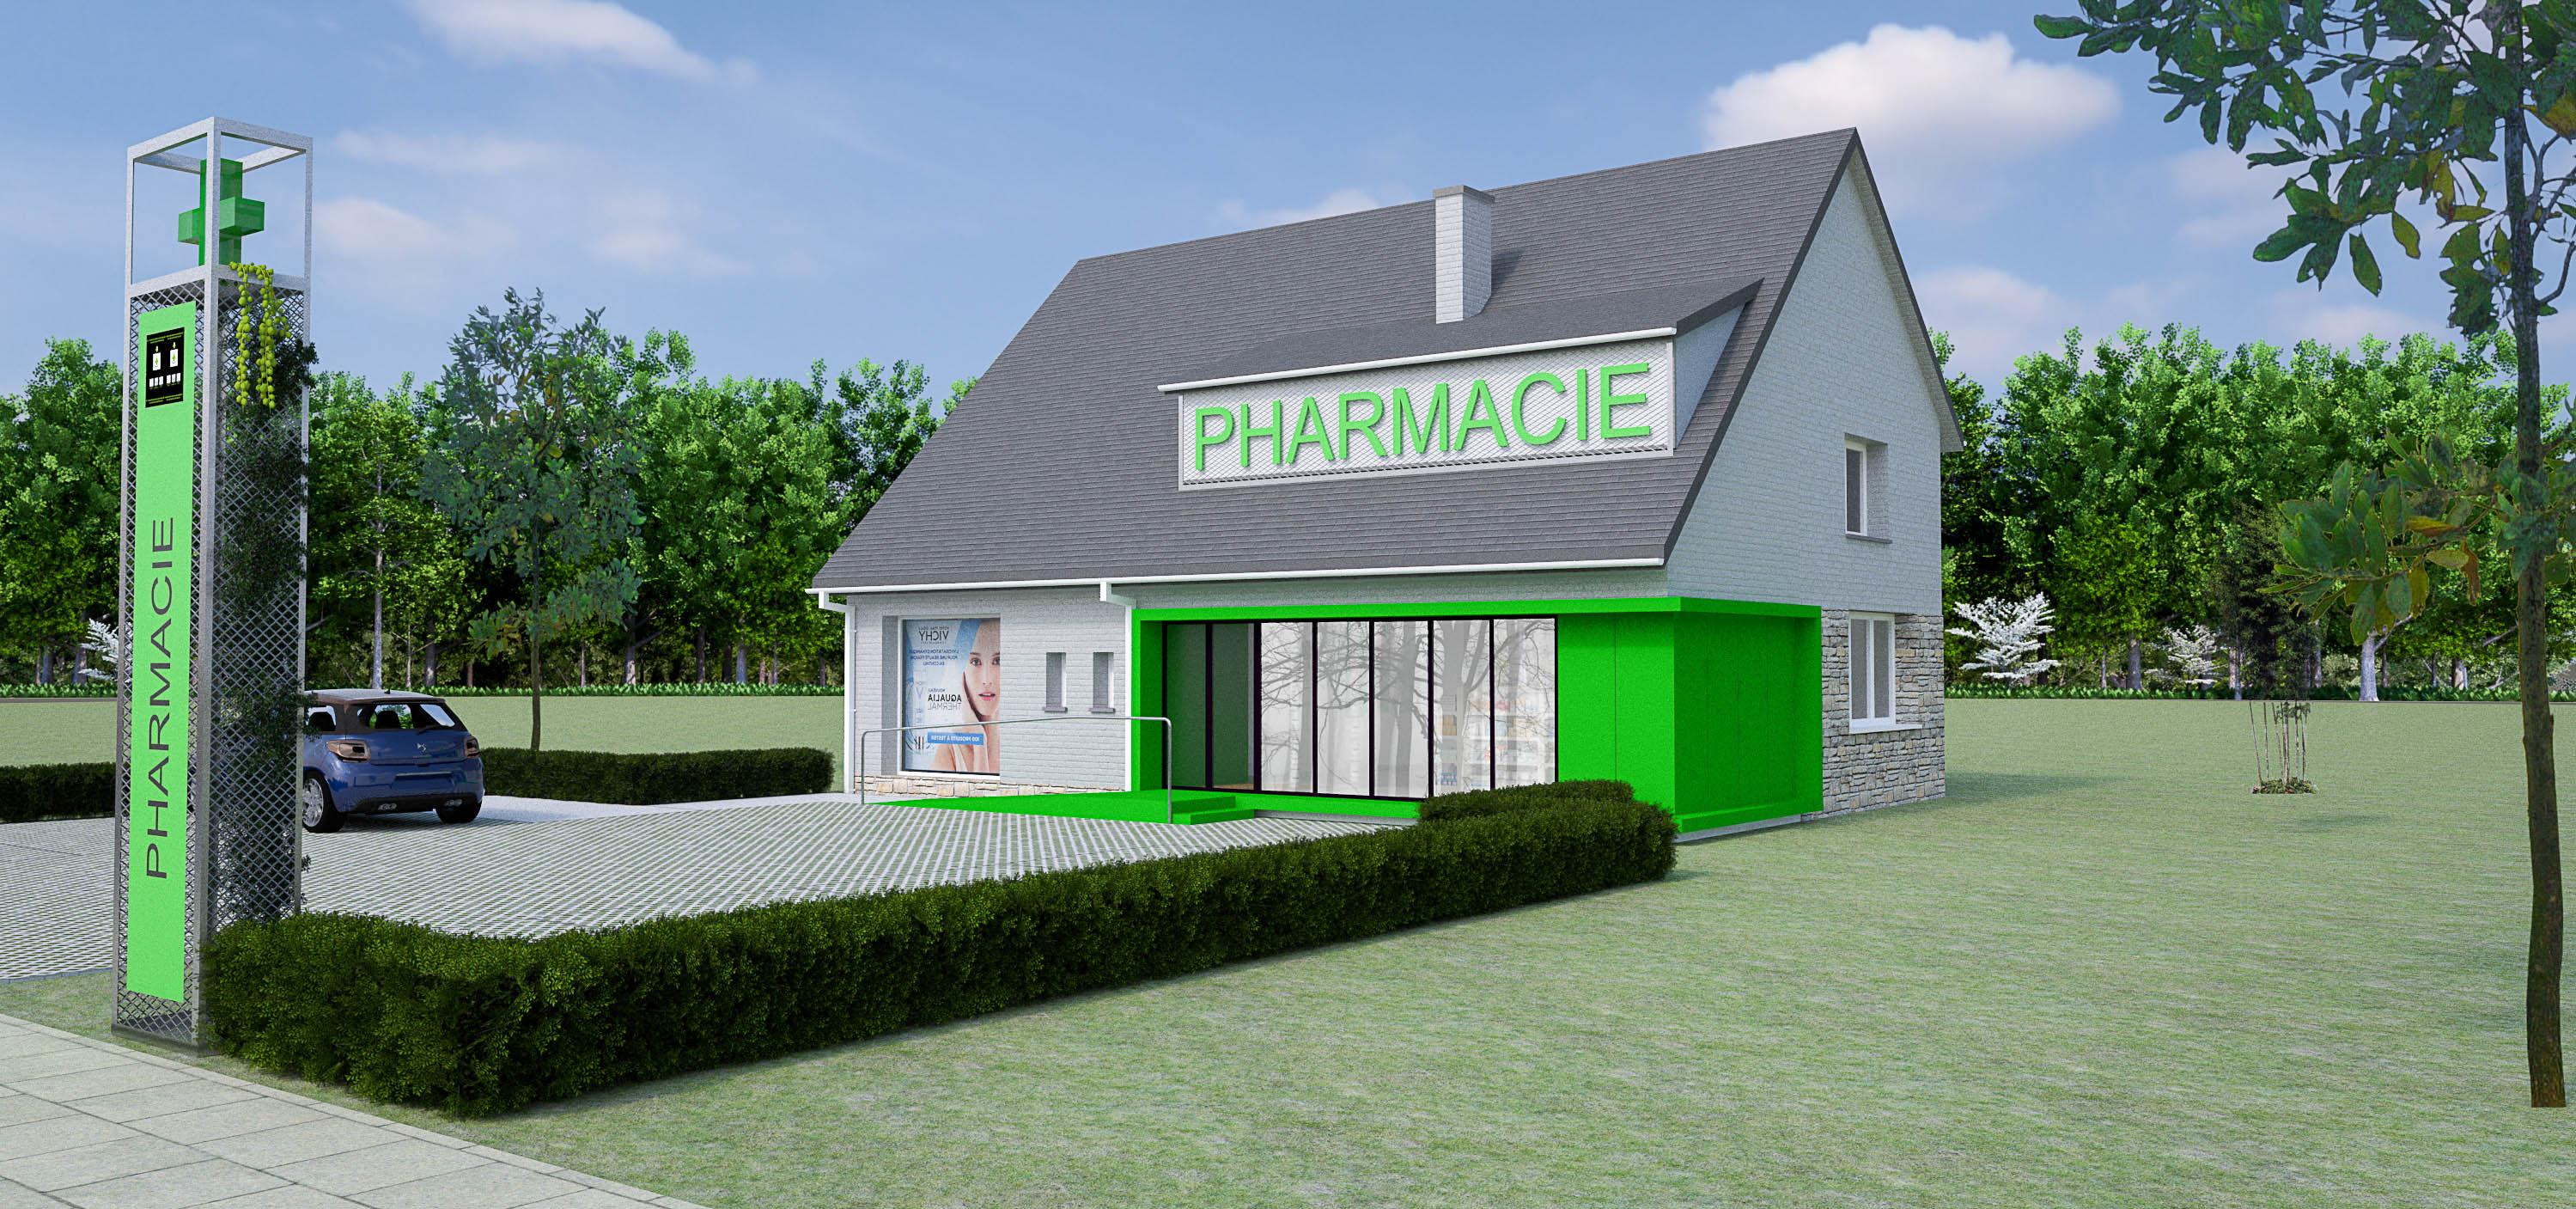 Pharmacie L, Angleur